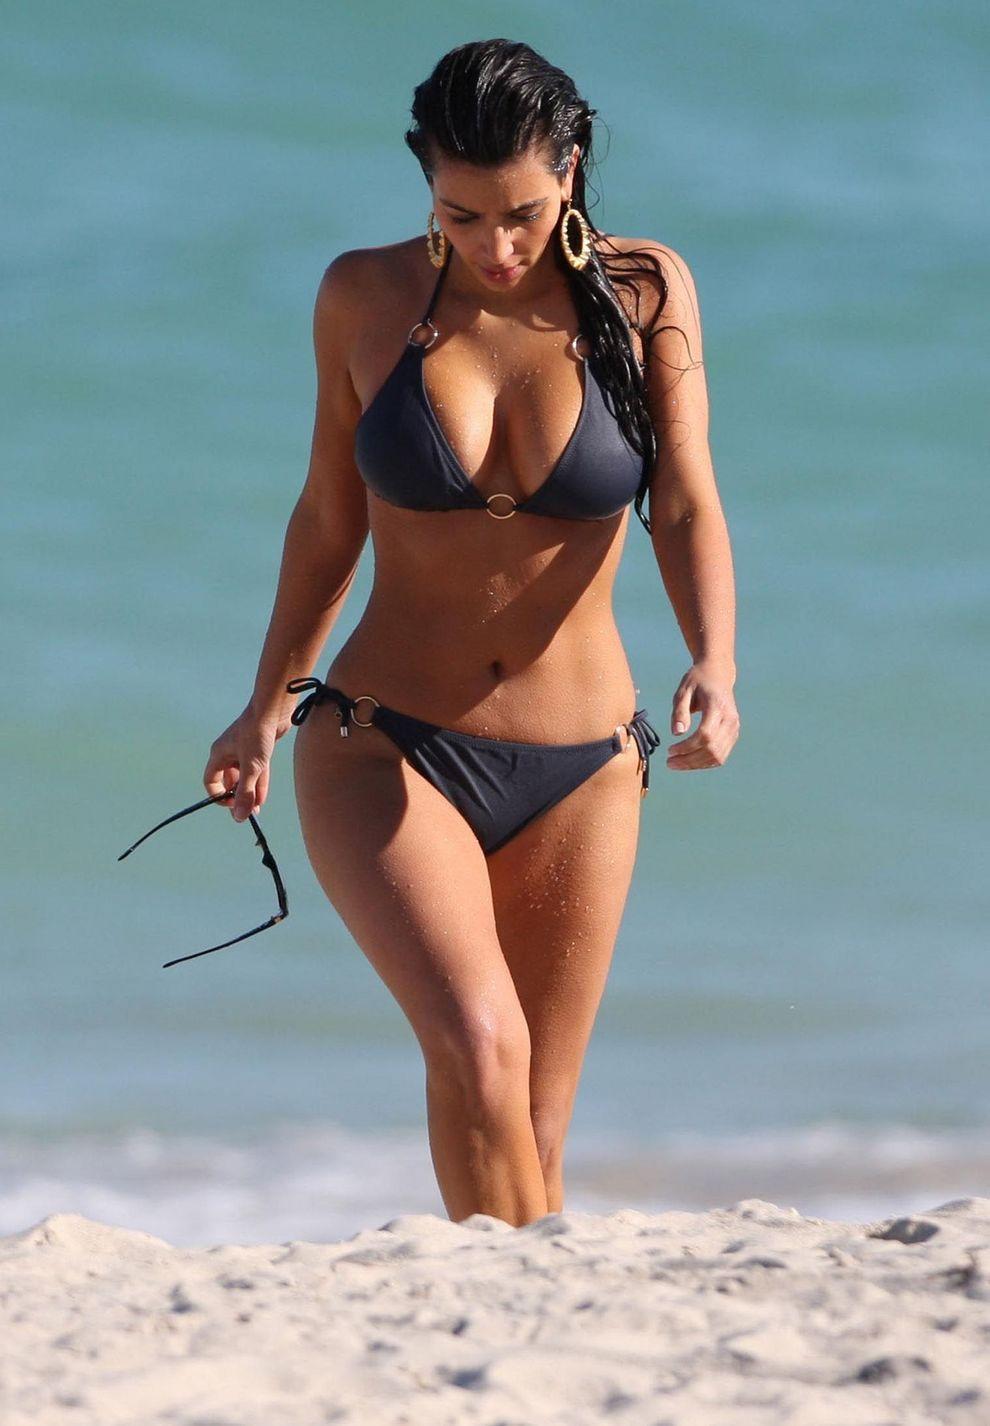 Courtney Cox - Fotos Desnuda - SexyFamosacom